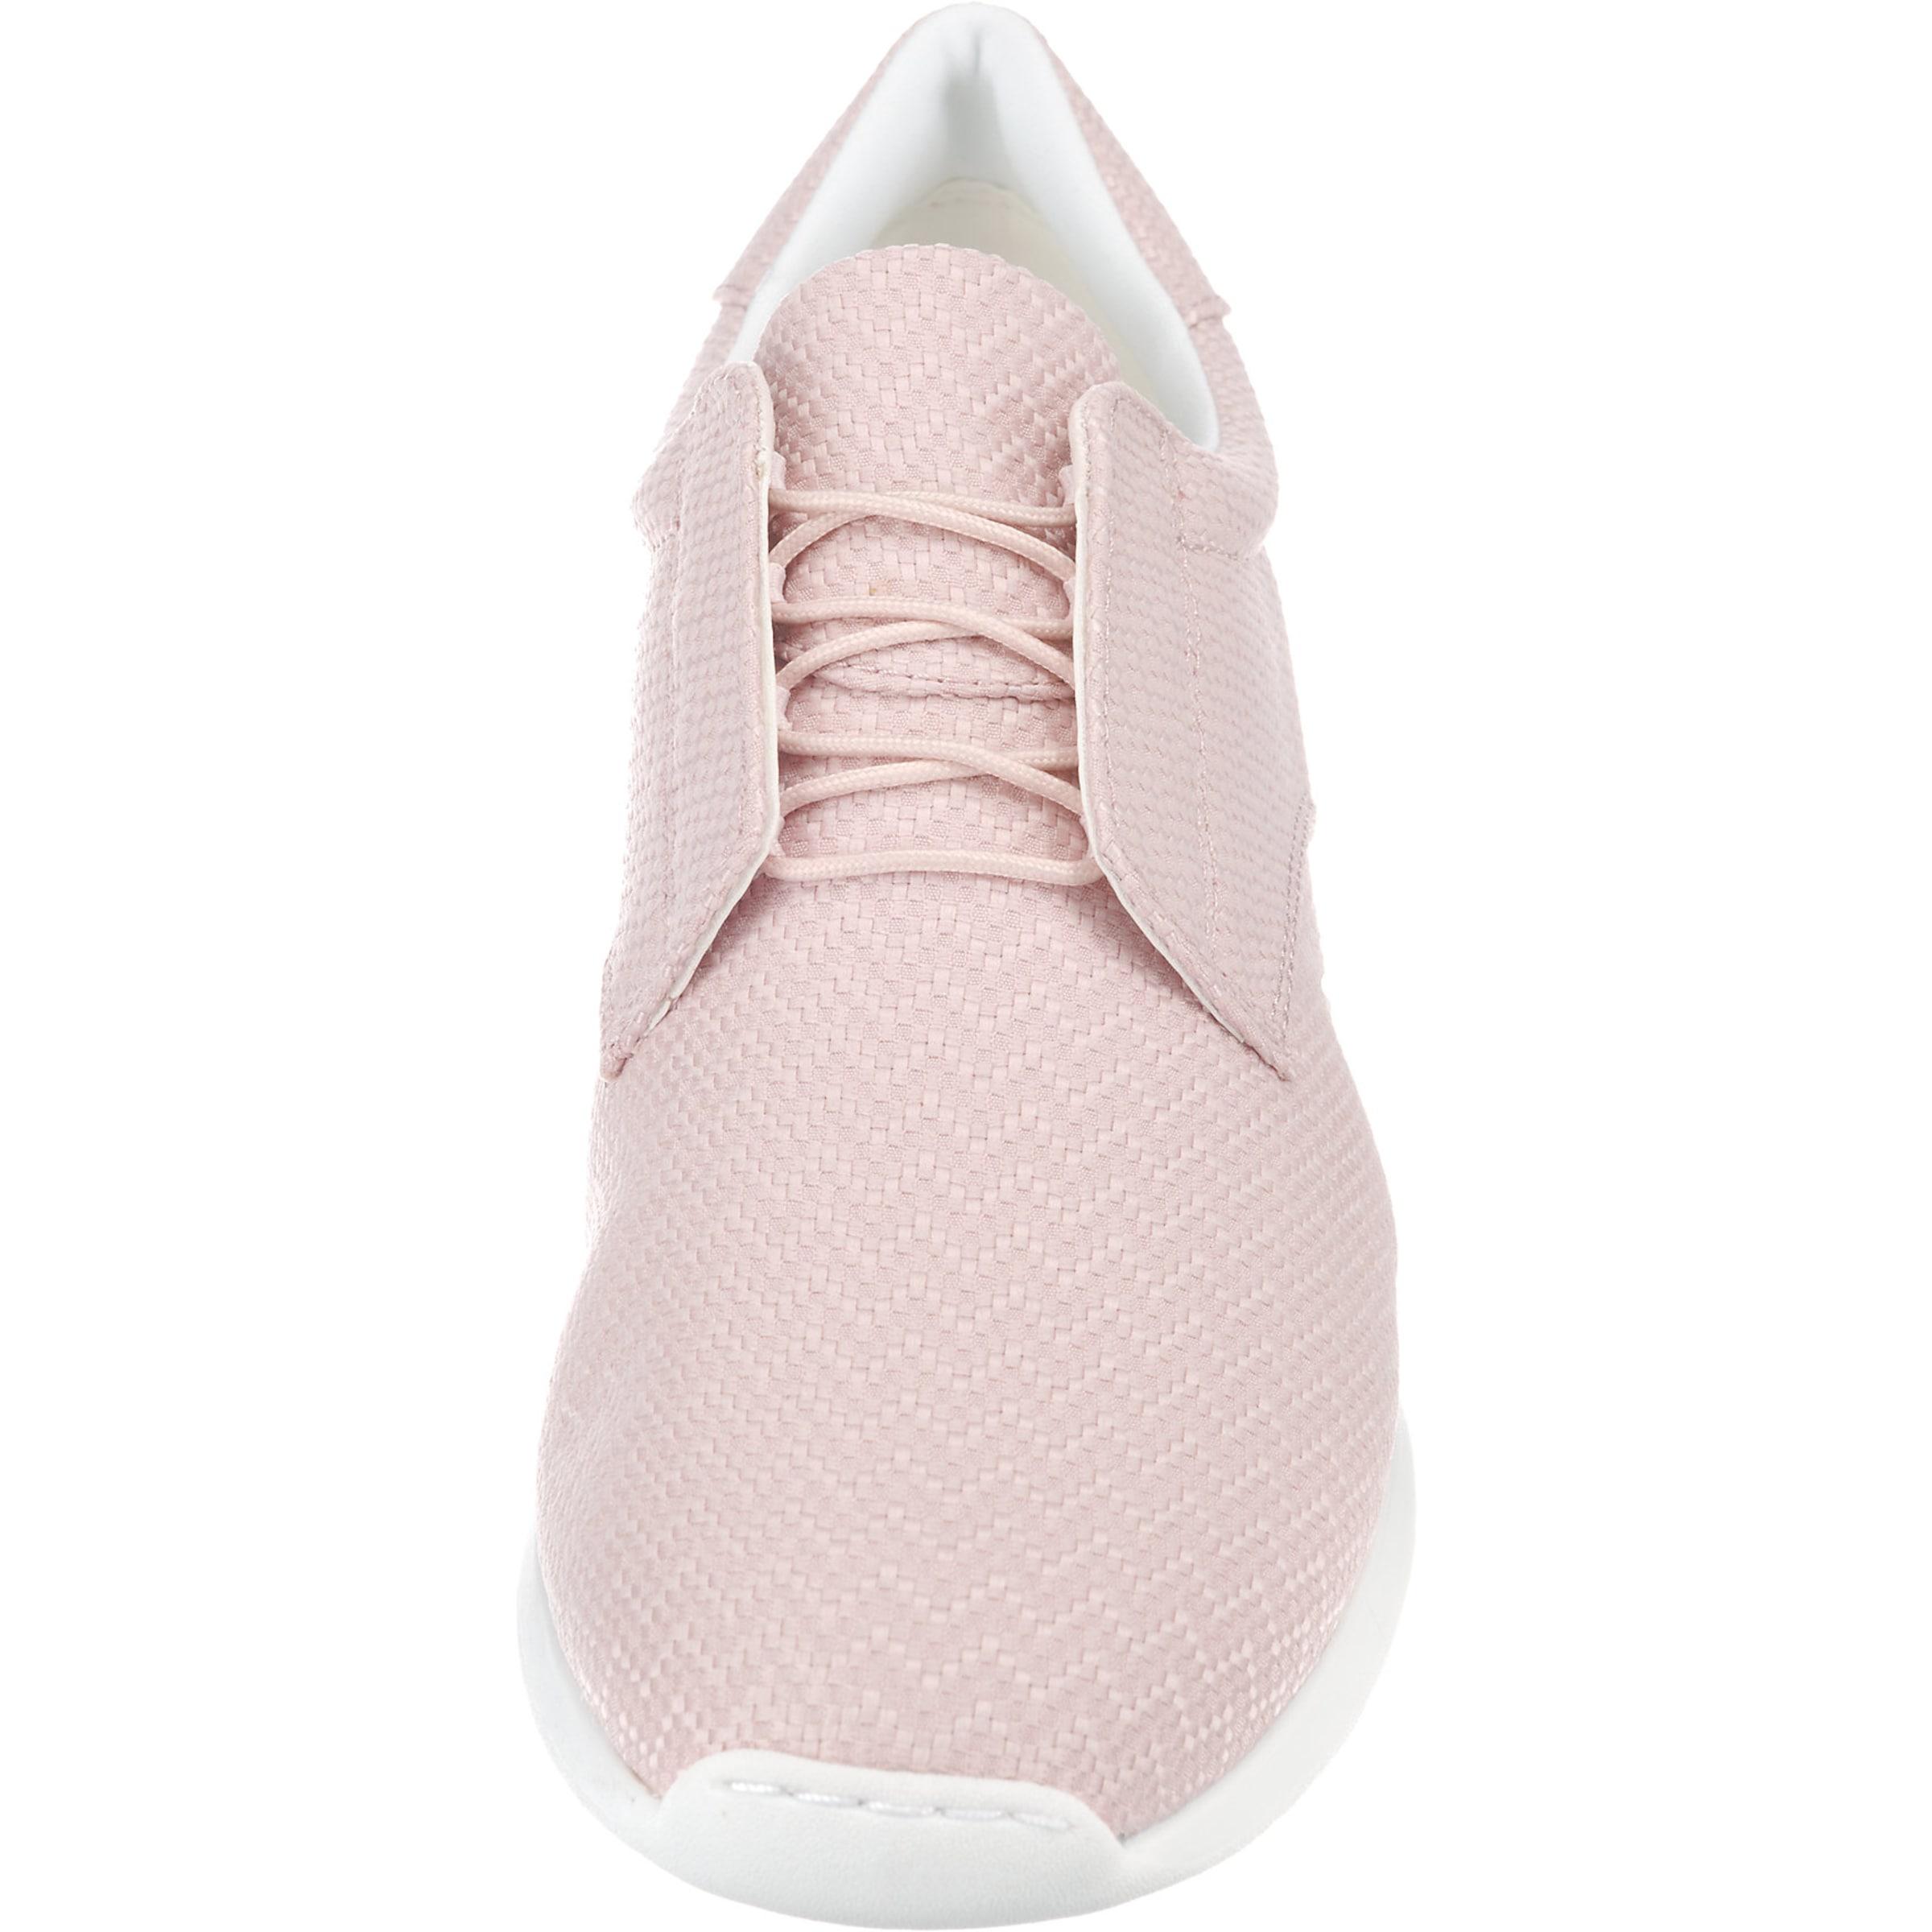 In 2 Rosa 0' 'kasai Vagabond Shoemakers Sneaker qLc3A54Rj